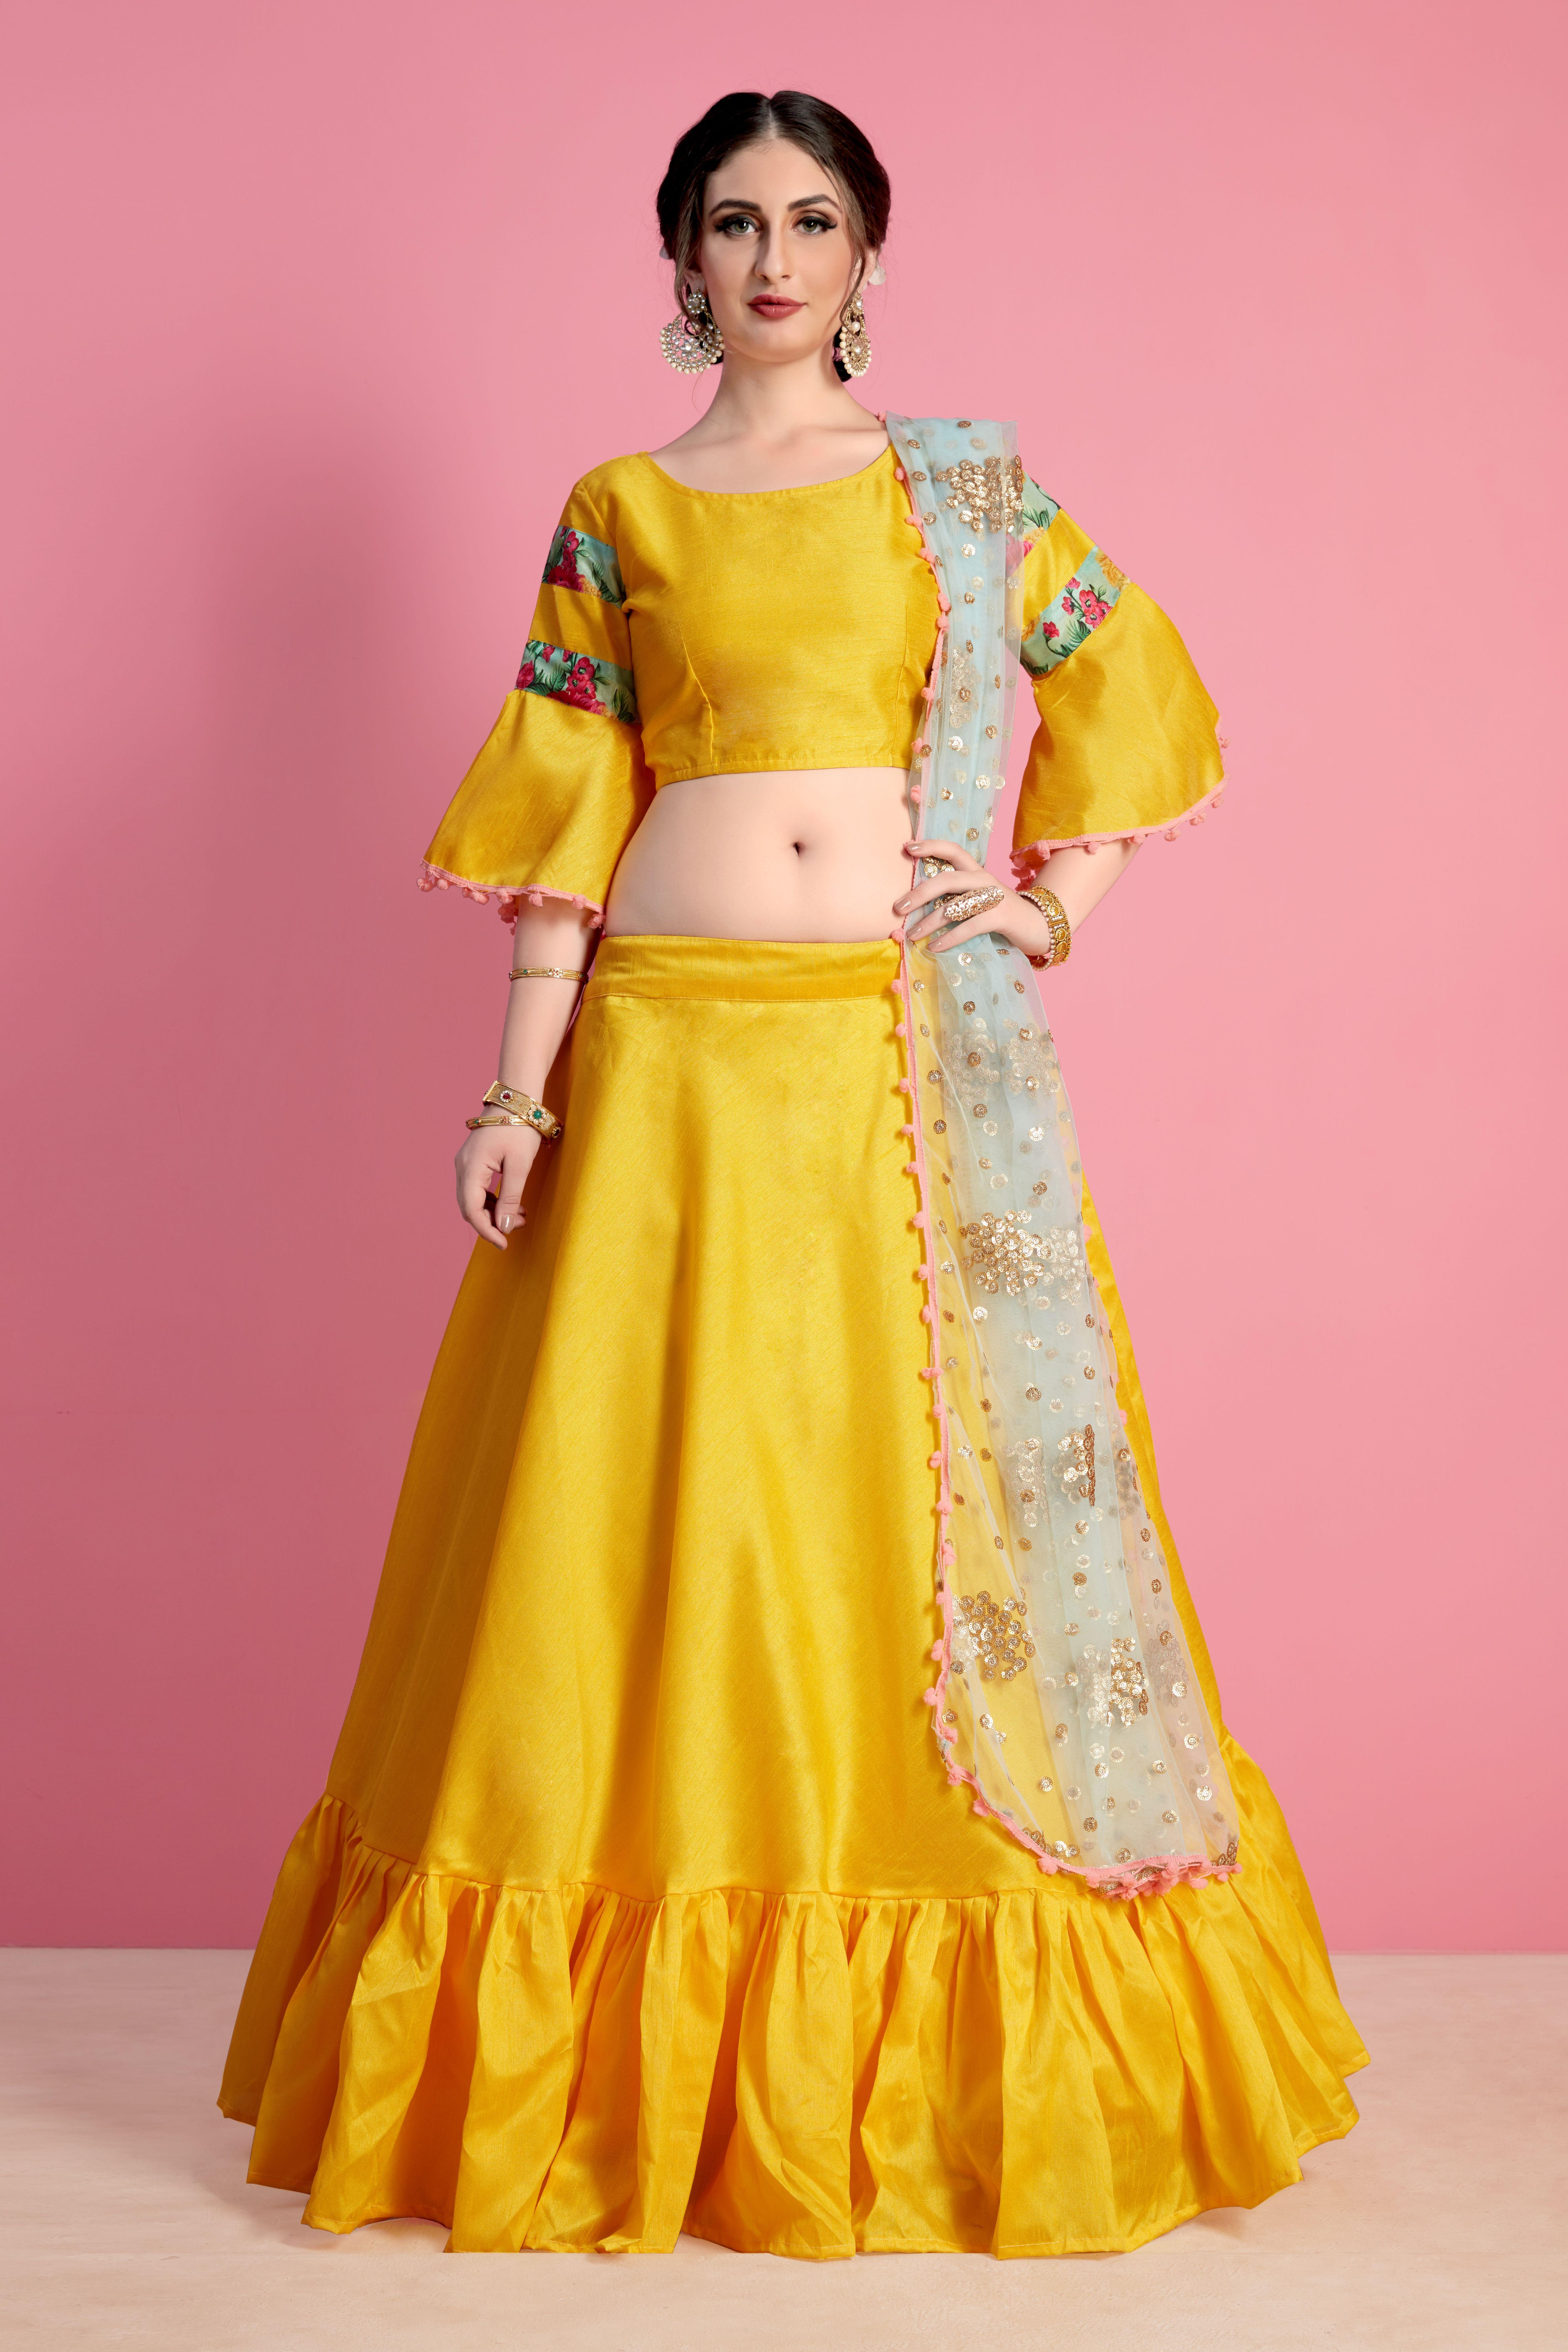 37f7012314 Haldi Yellow Embroidered Banglori Silk Base Lehenga Choli in 2019 ...